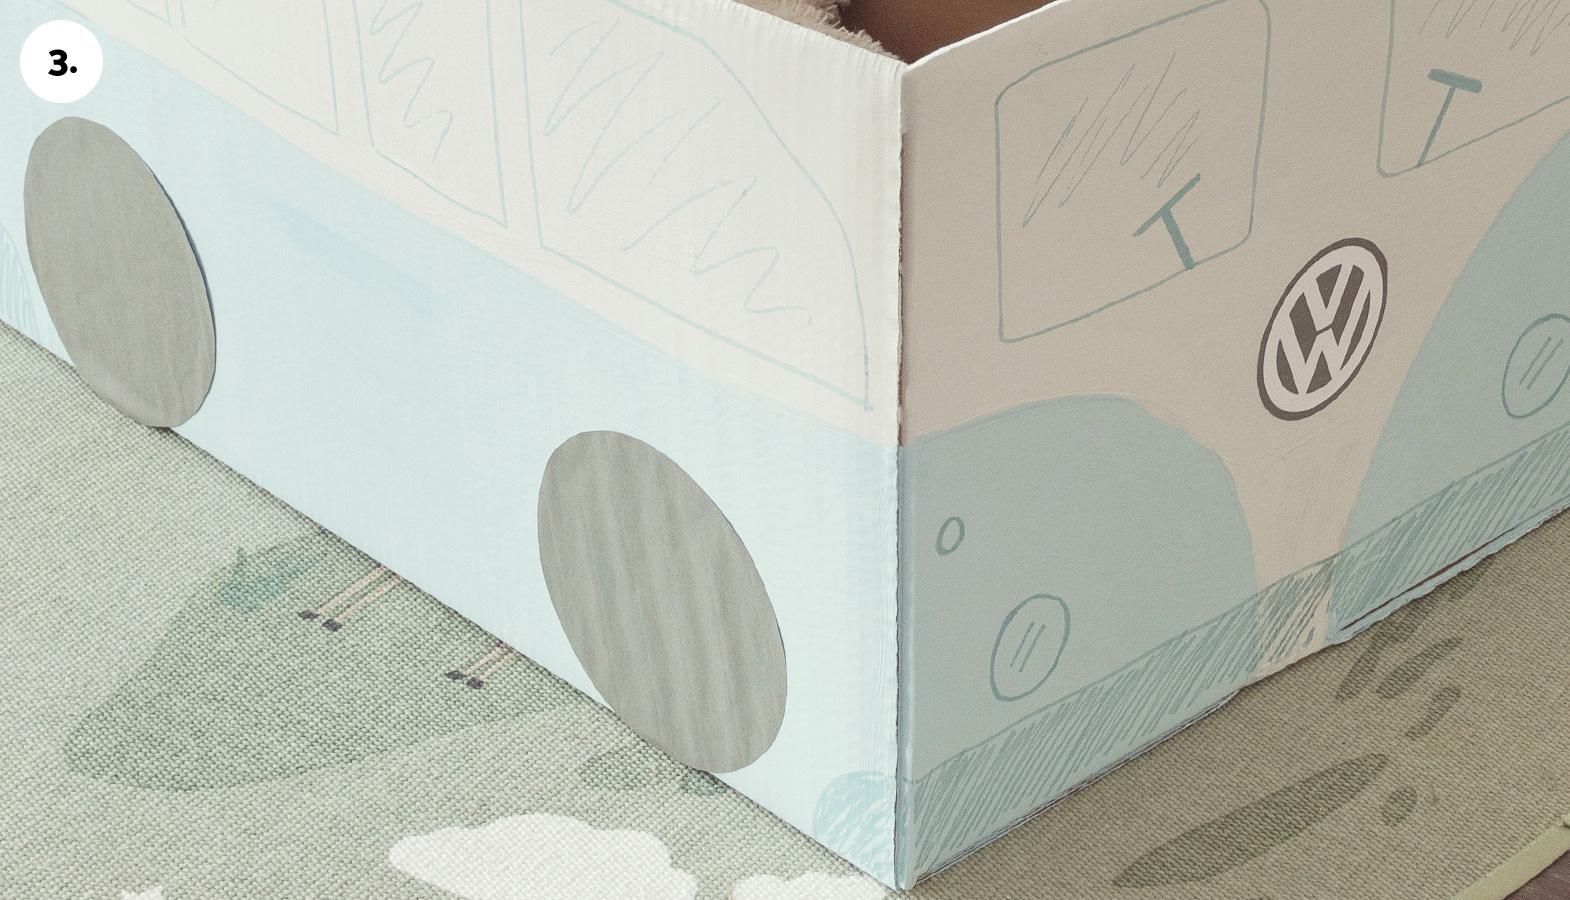 hračky z krabic